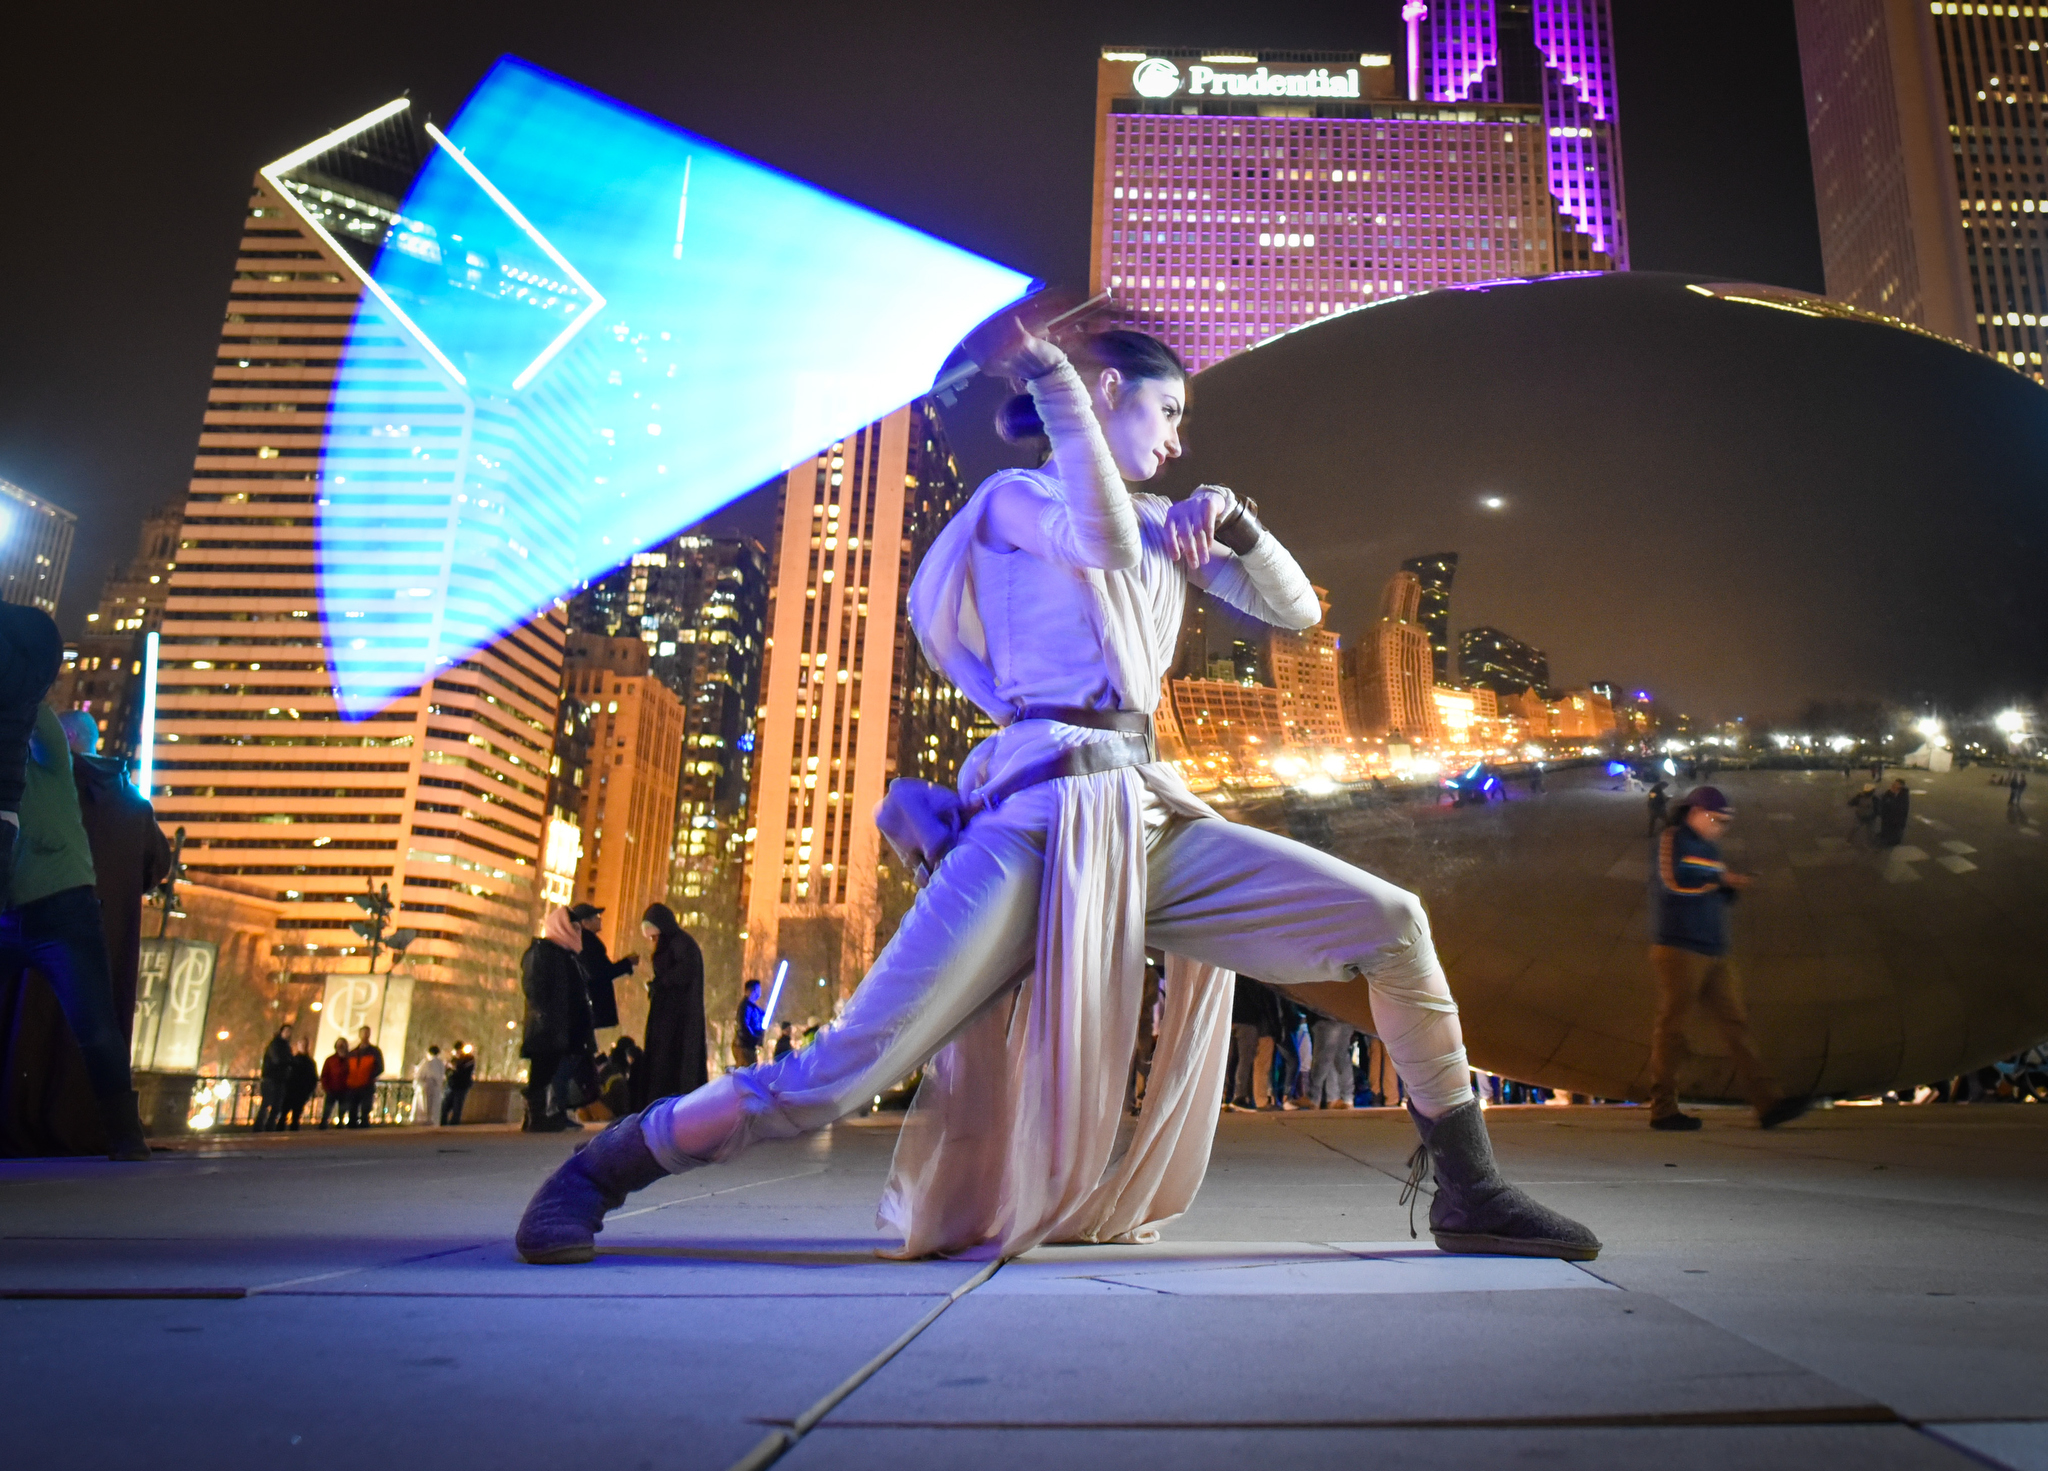 2019.04.14 - Star Wars Celebration Chicago 288913.JPG